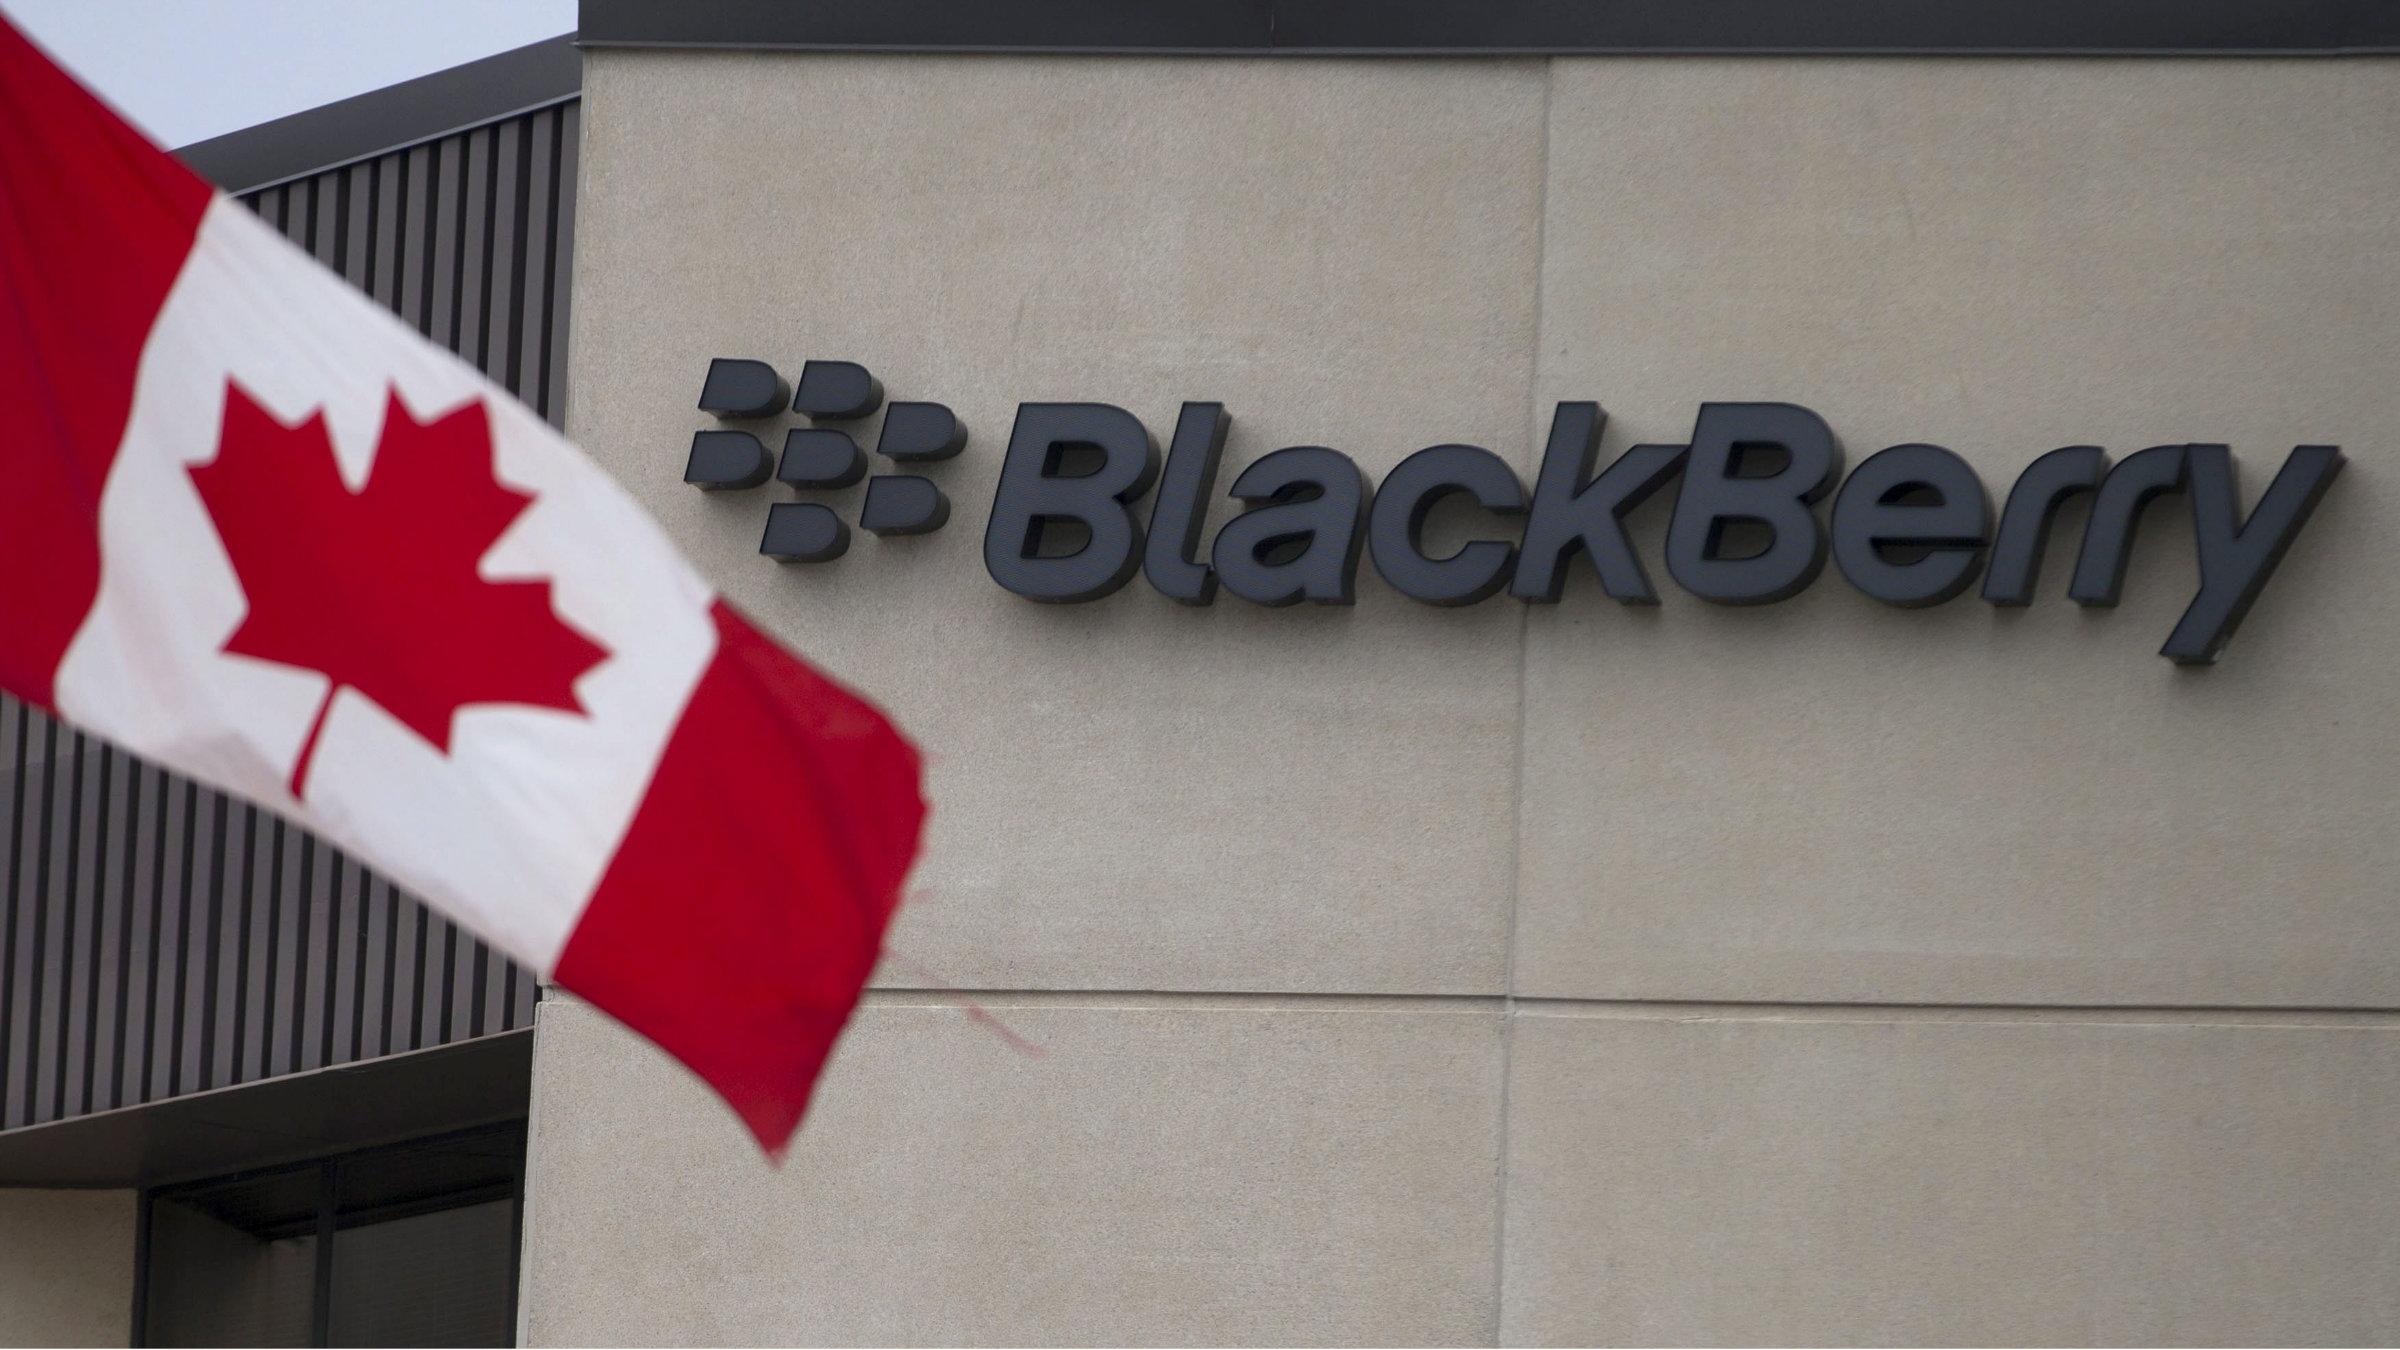 blackberry canadian flag